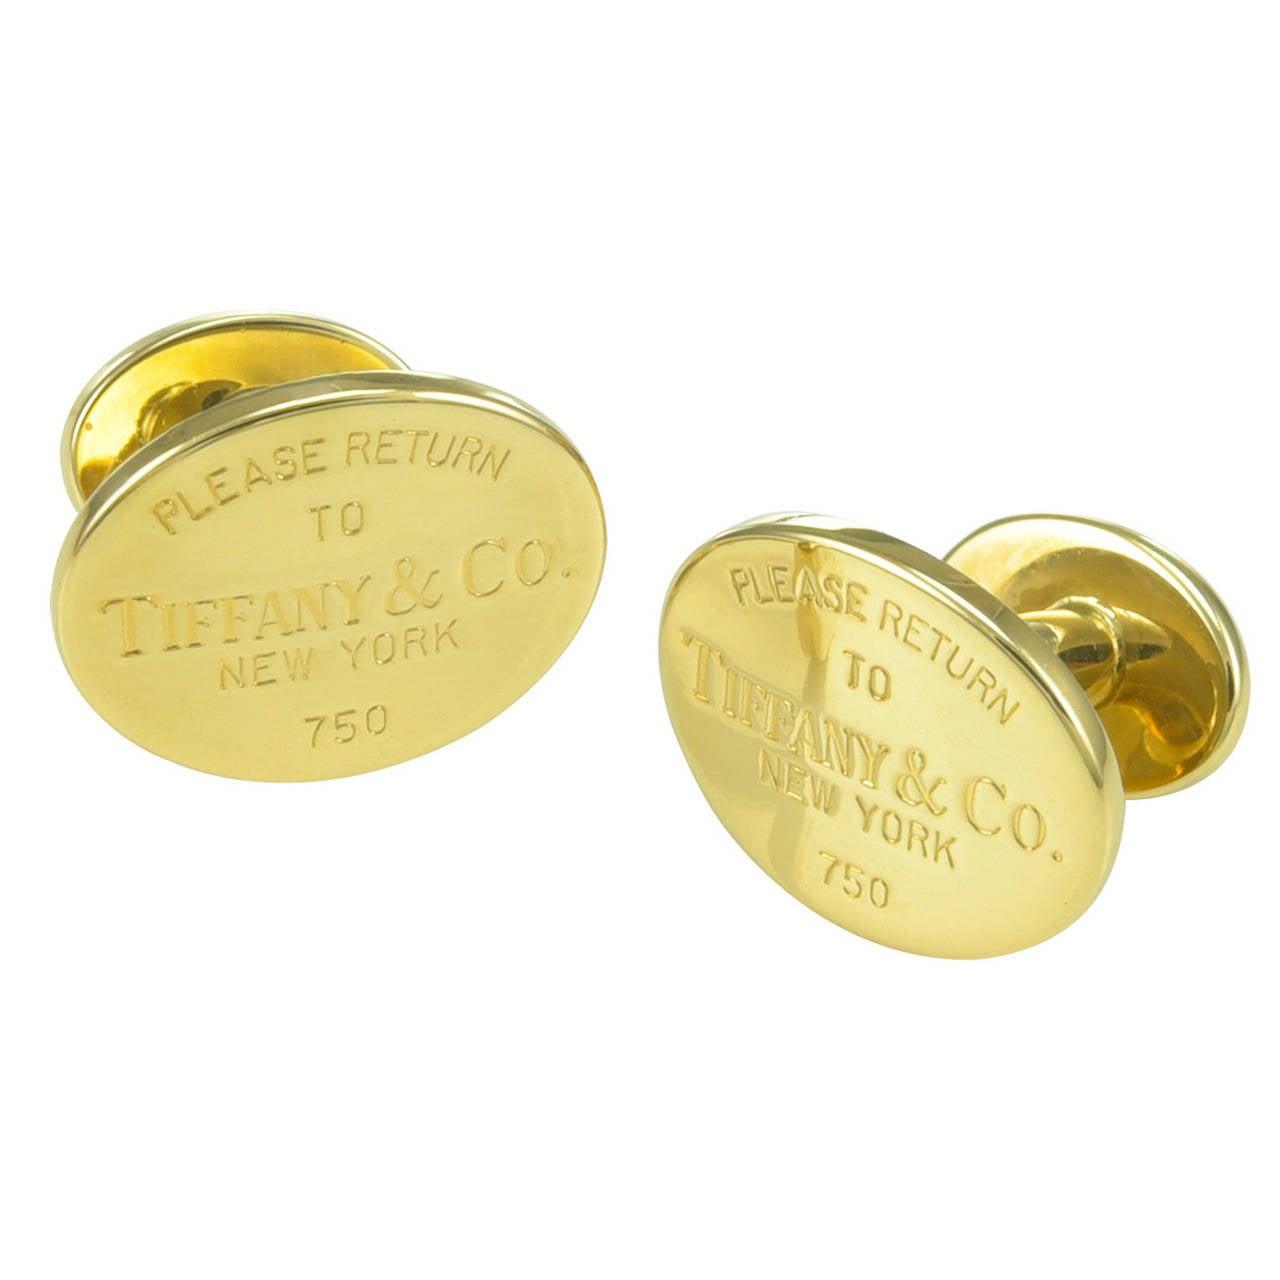 Jewelry Cufflinks Cufflinks Tiffany Co Gold Cufflinks Id J 610382 Tiffany Cuff Links